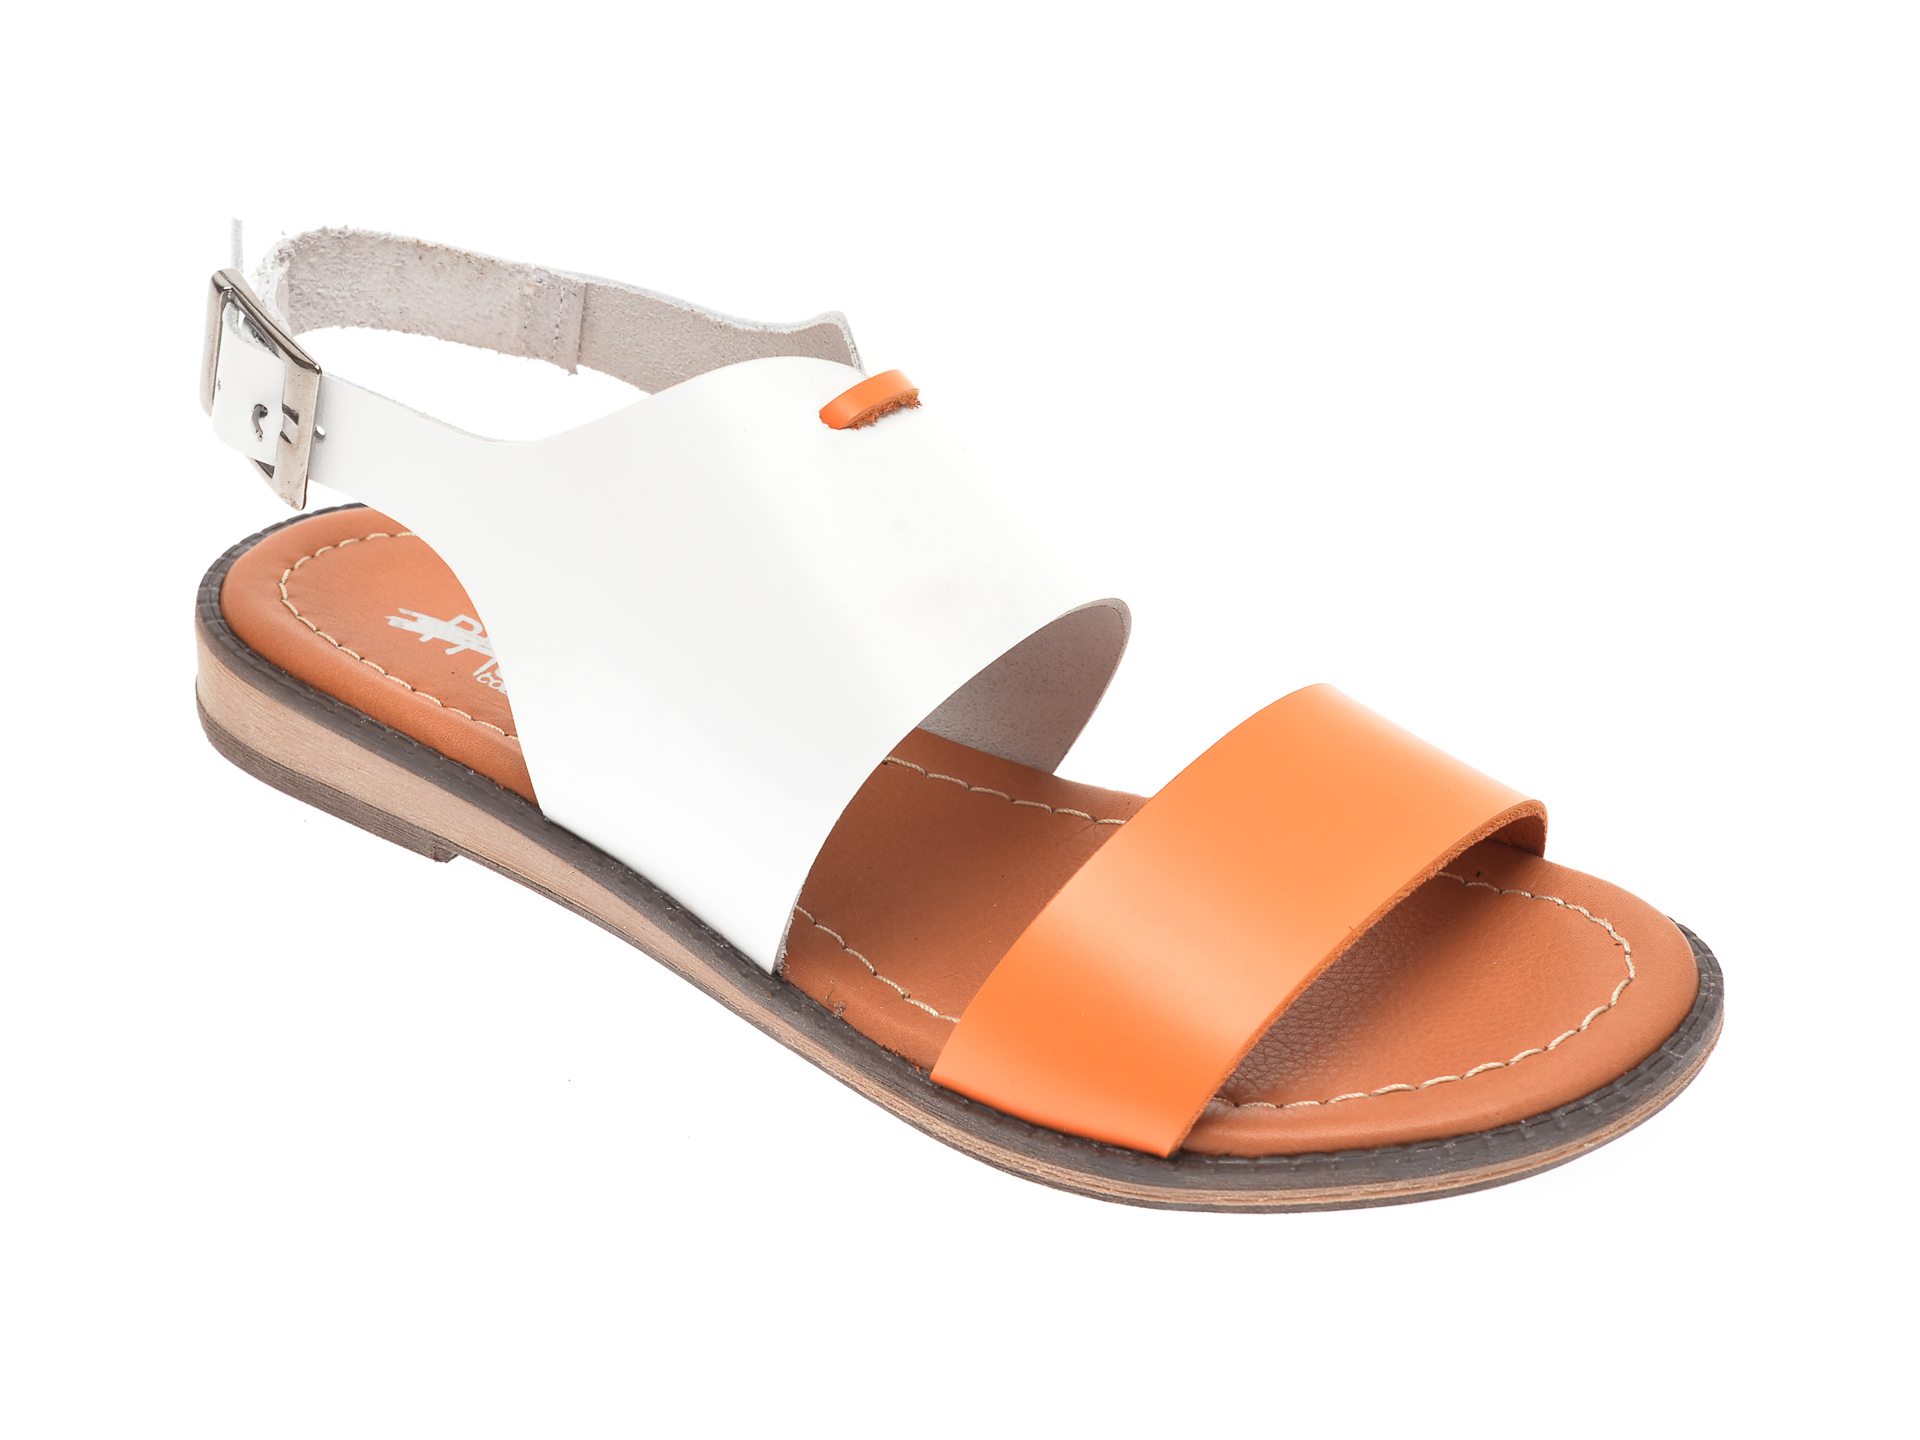 Sandale PASS COLLECTION portocalii, 1013K, din piele naturala